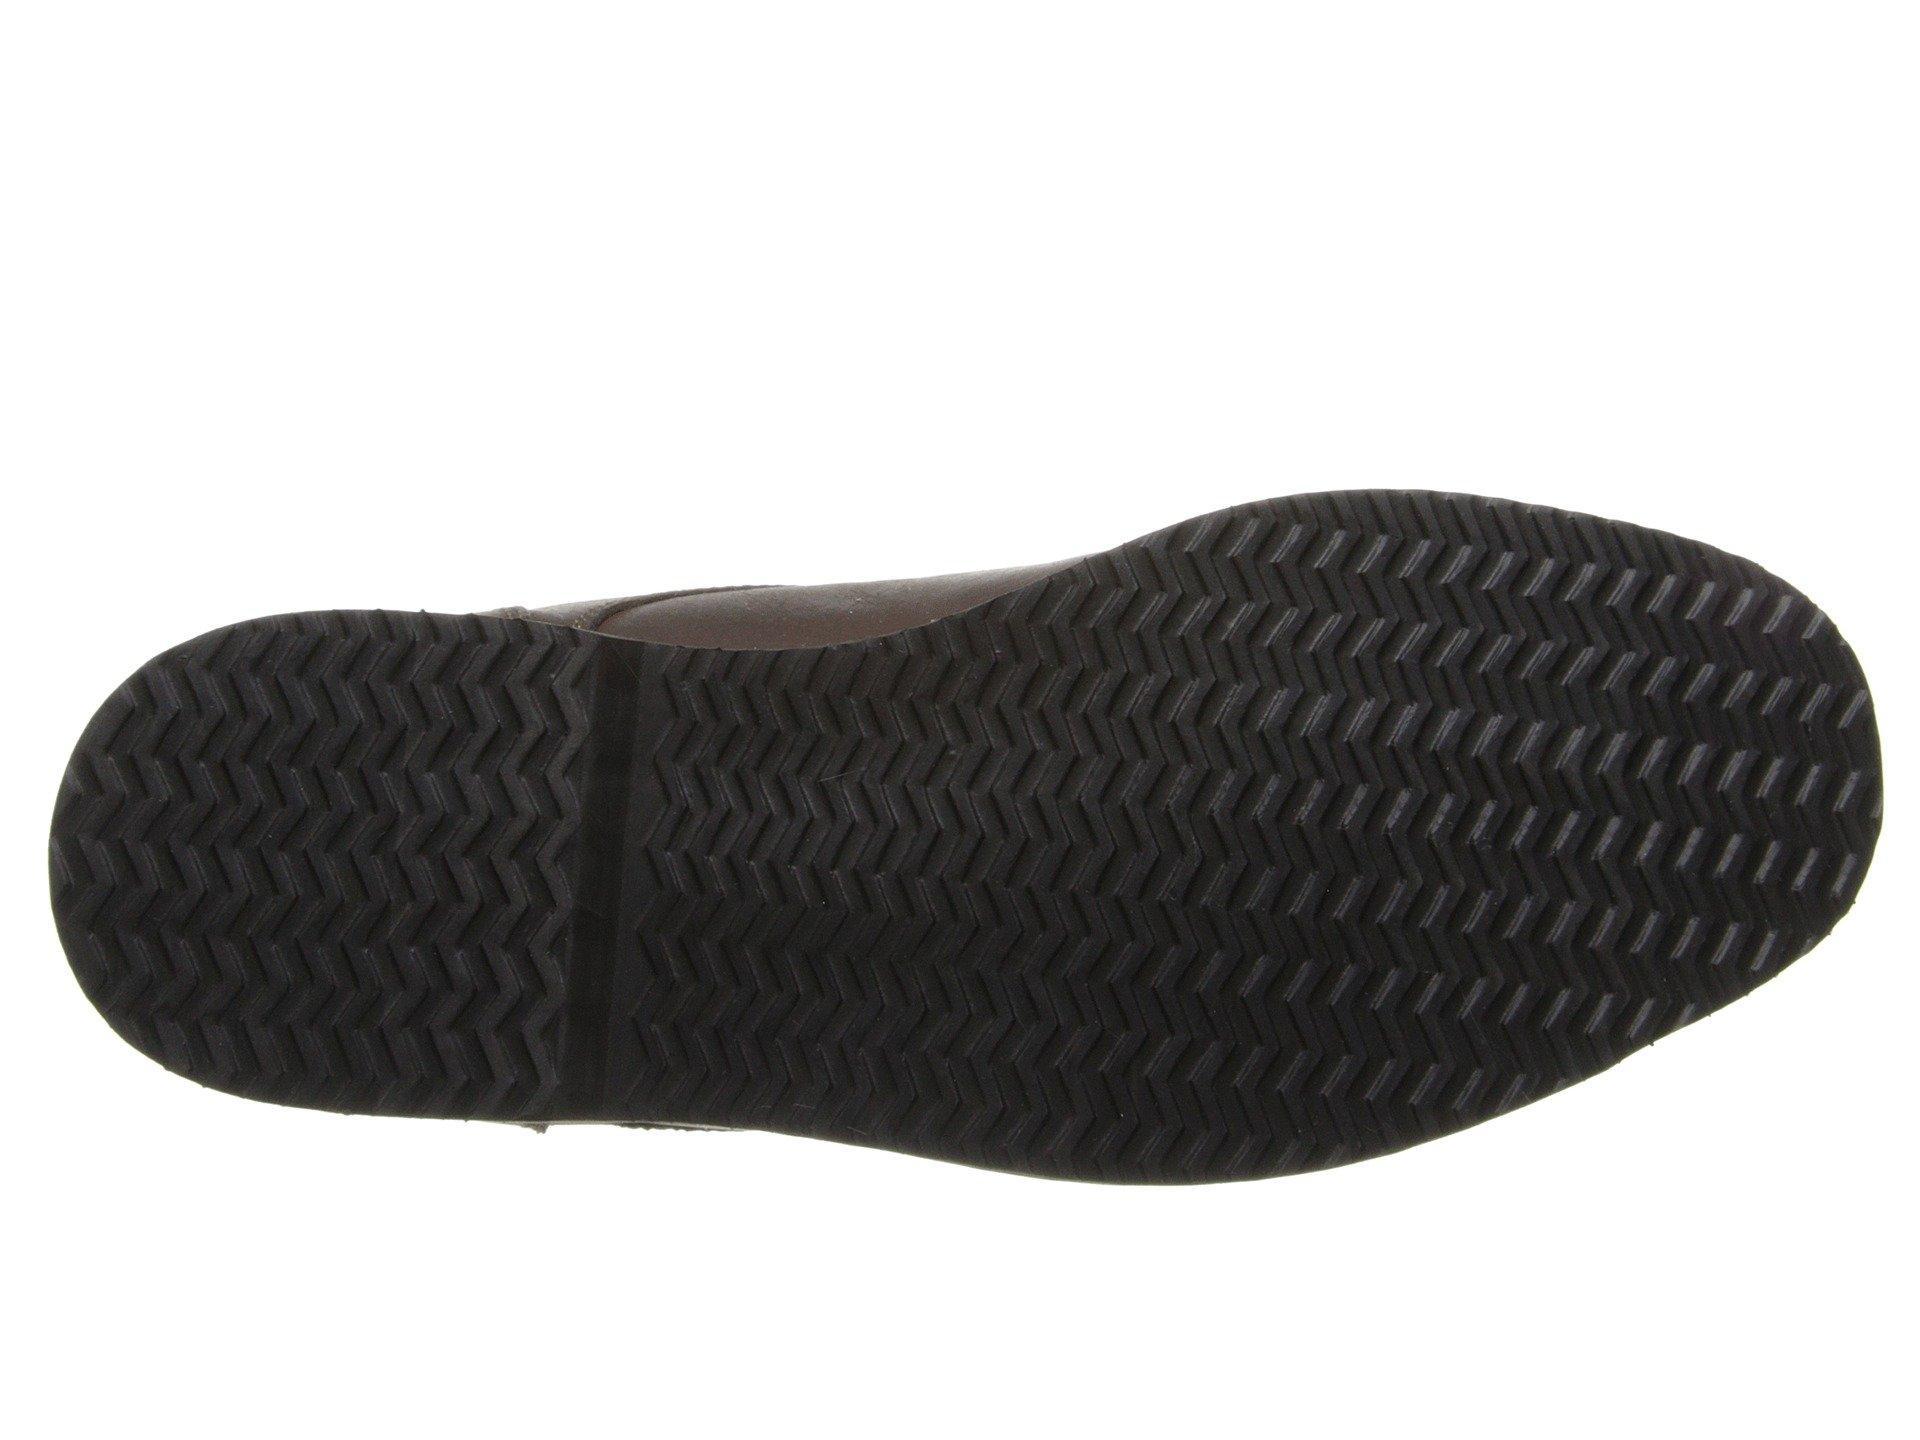 Lyst Nunn Bush Woodbury Plain Toe Casual Chukka Boot In